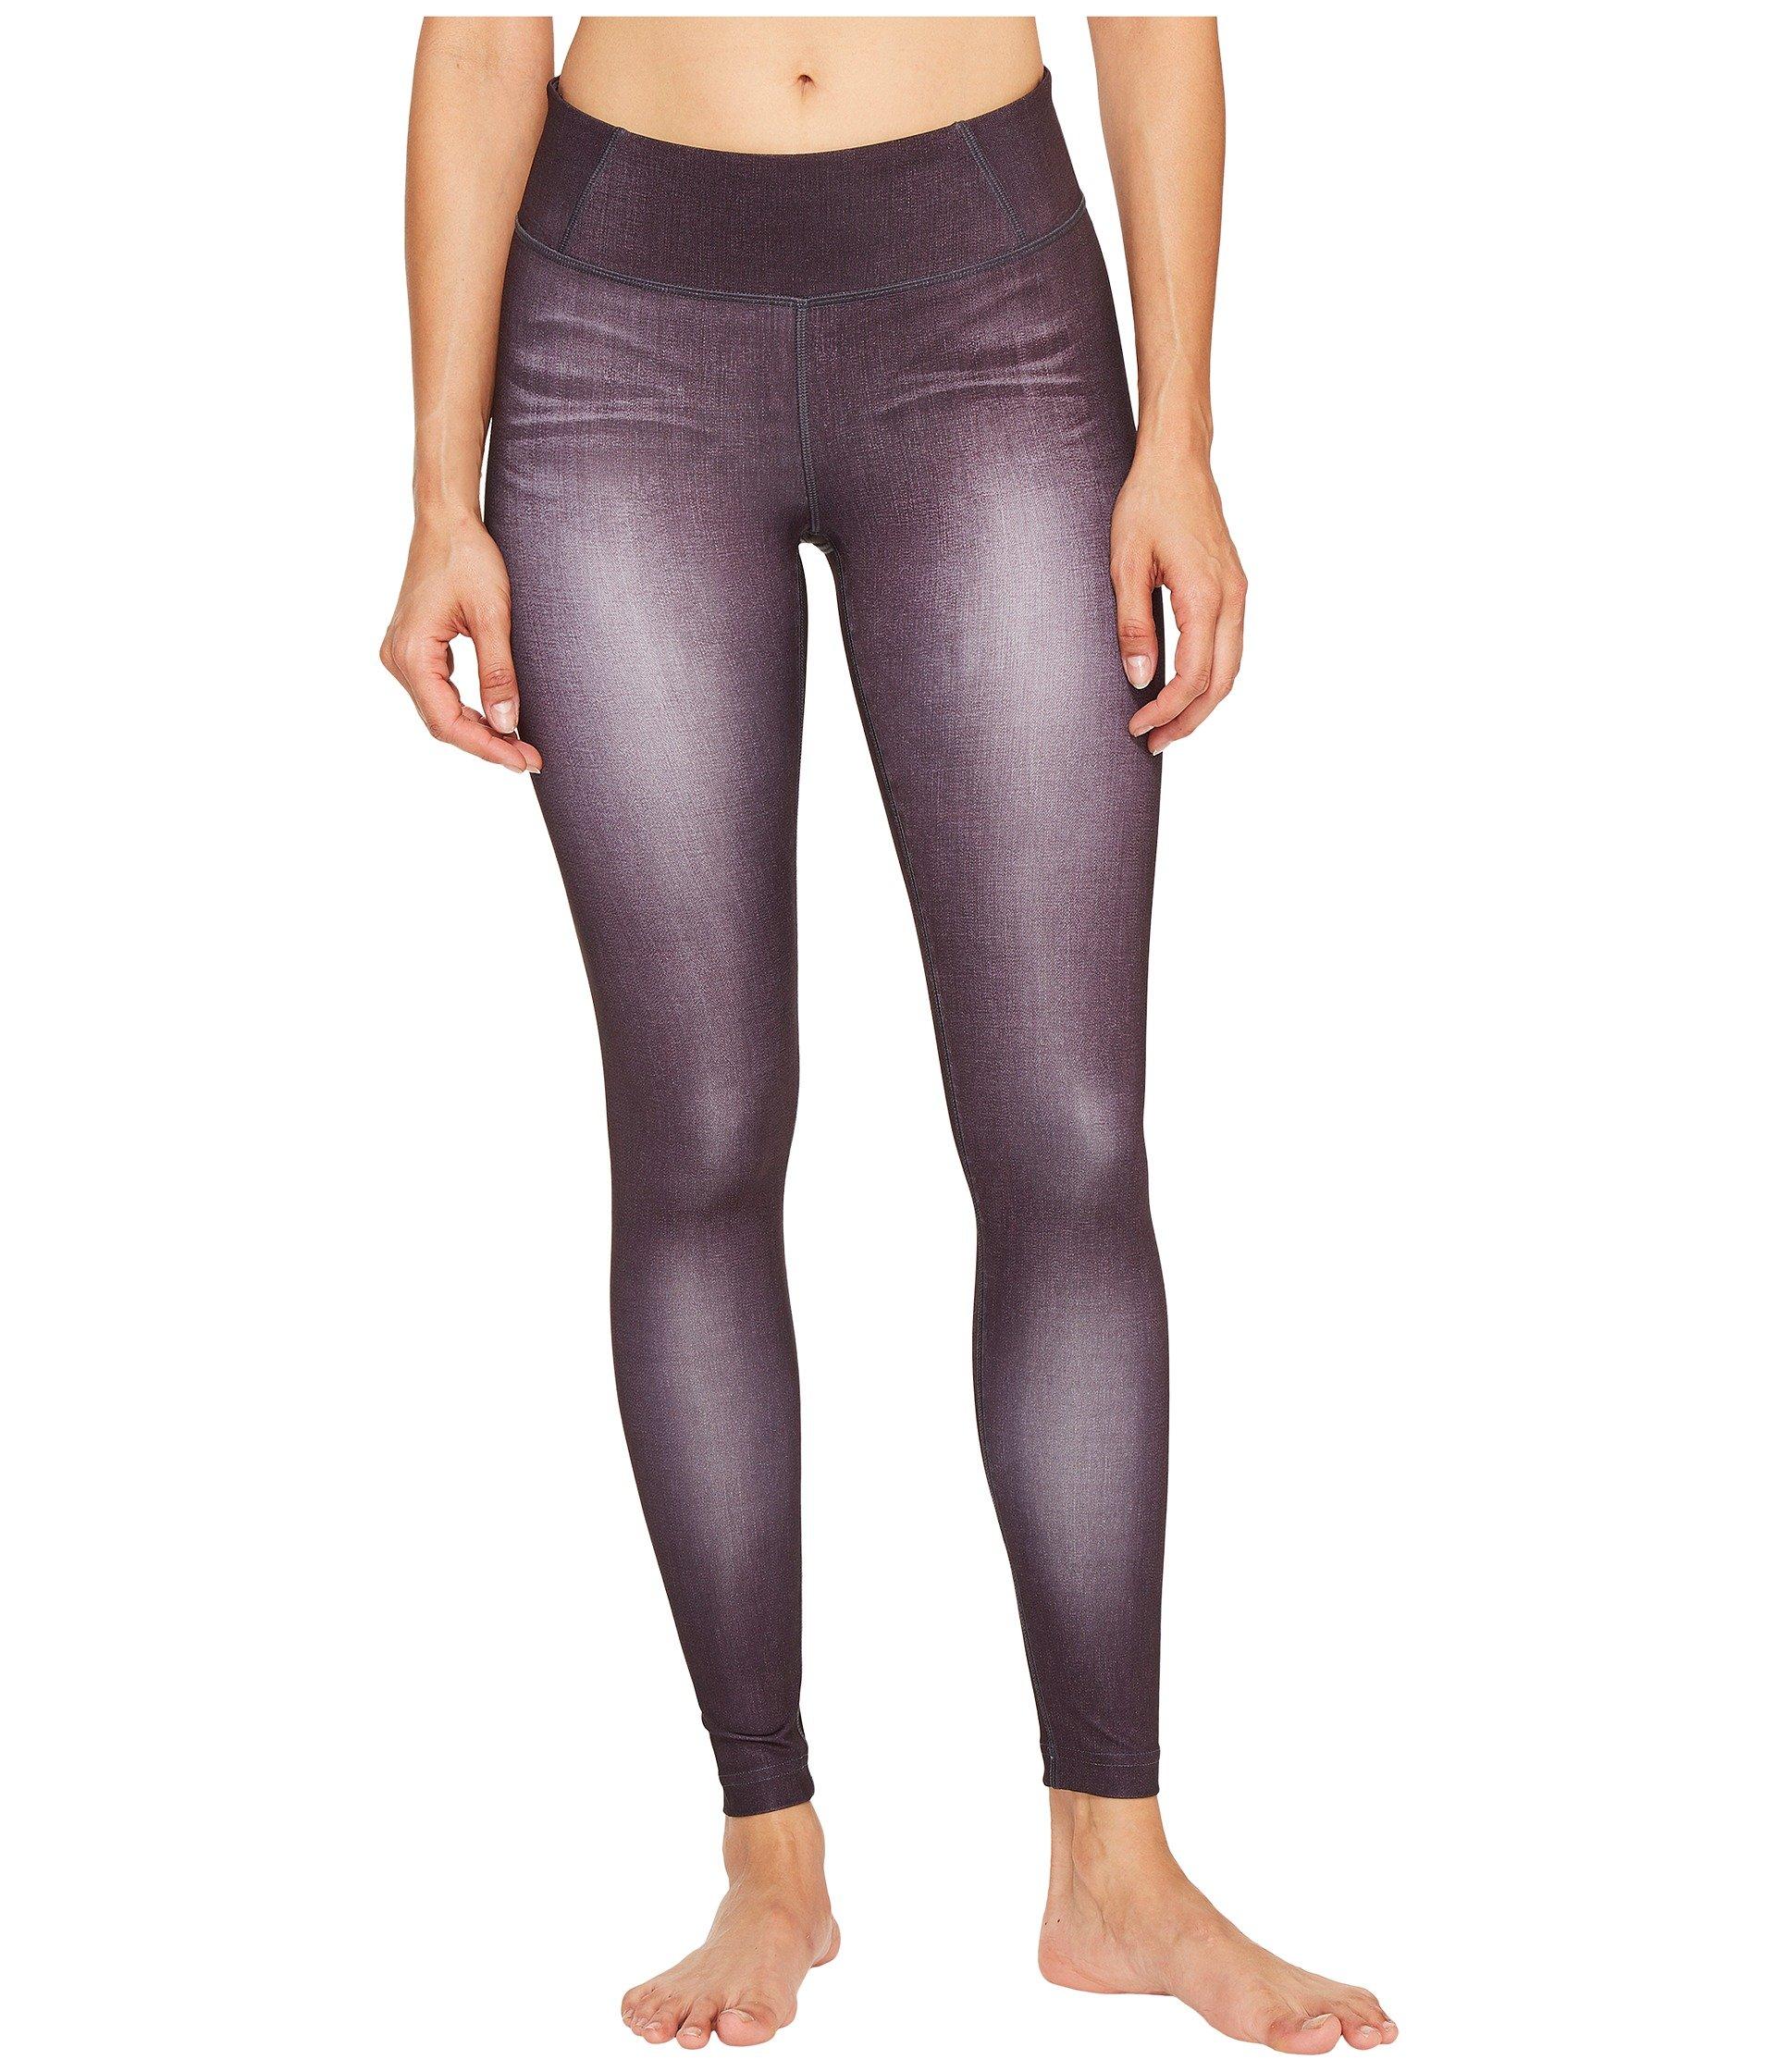 Lucy Women's Indigo Run Tights Black Indigo Pants by Lucy